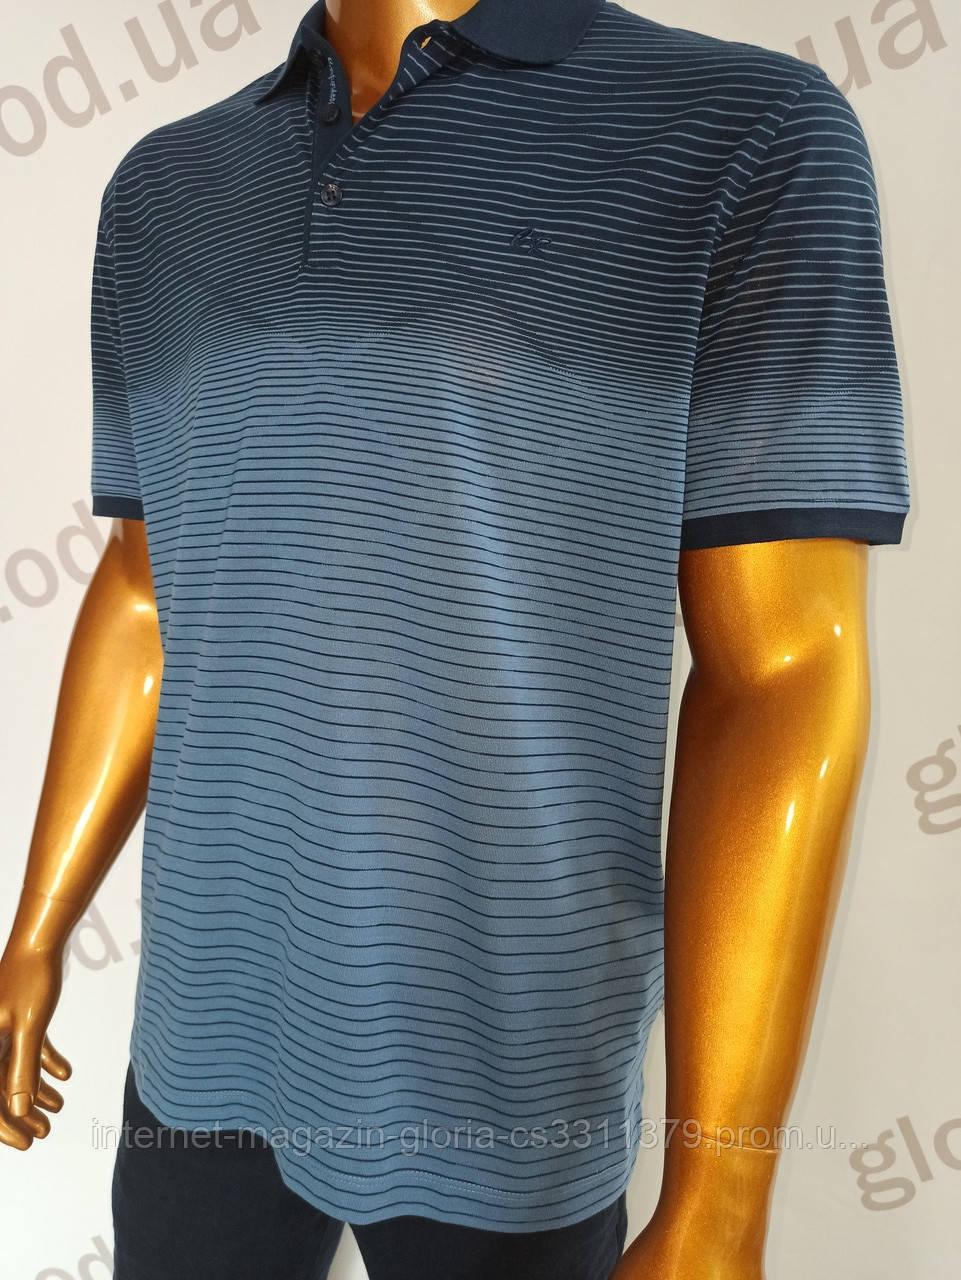 Мужская футболка поло Caporicco. PSL-8813s. Размеры Батал  2Xl(2),3XL,4XL.